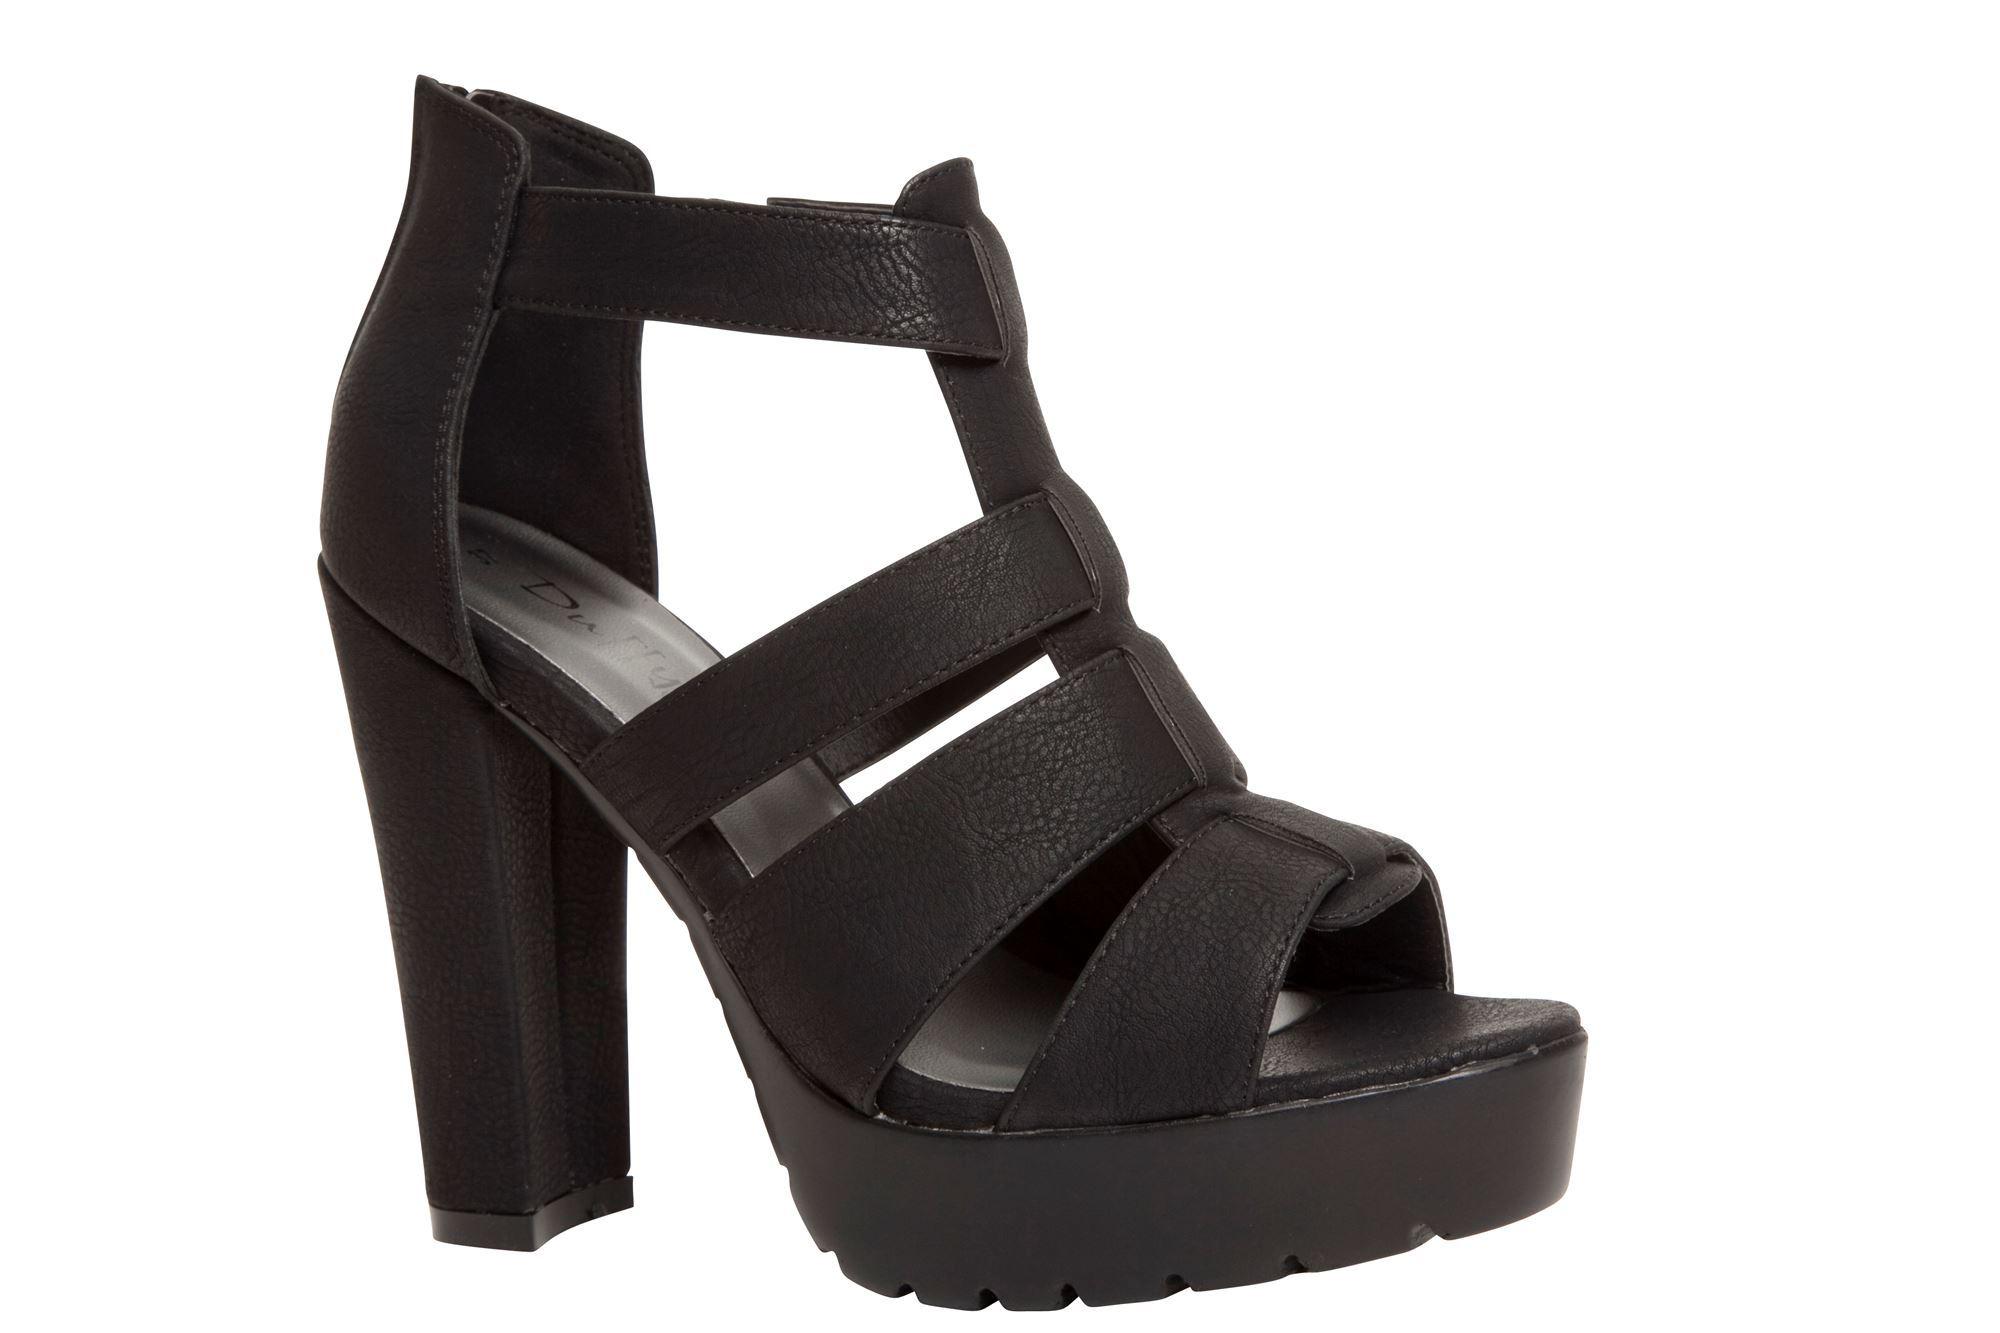 c4f5d8facba Duffy høj sandal, sort - flot højhælet sandal med remme